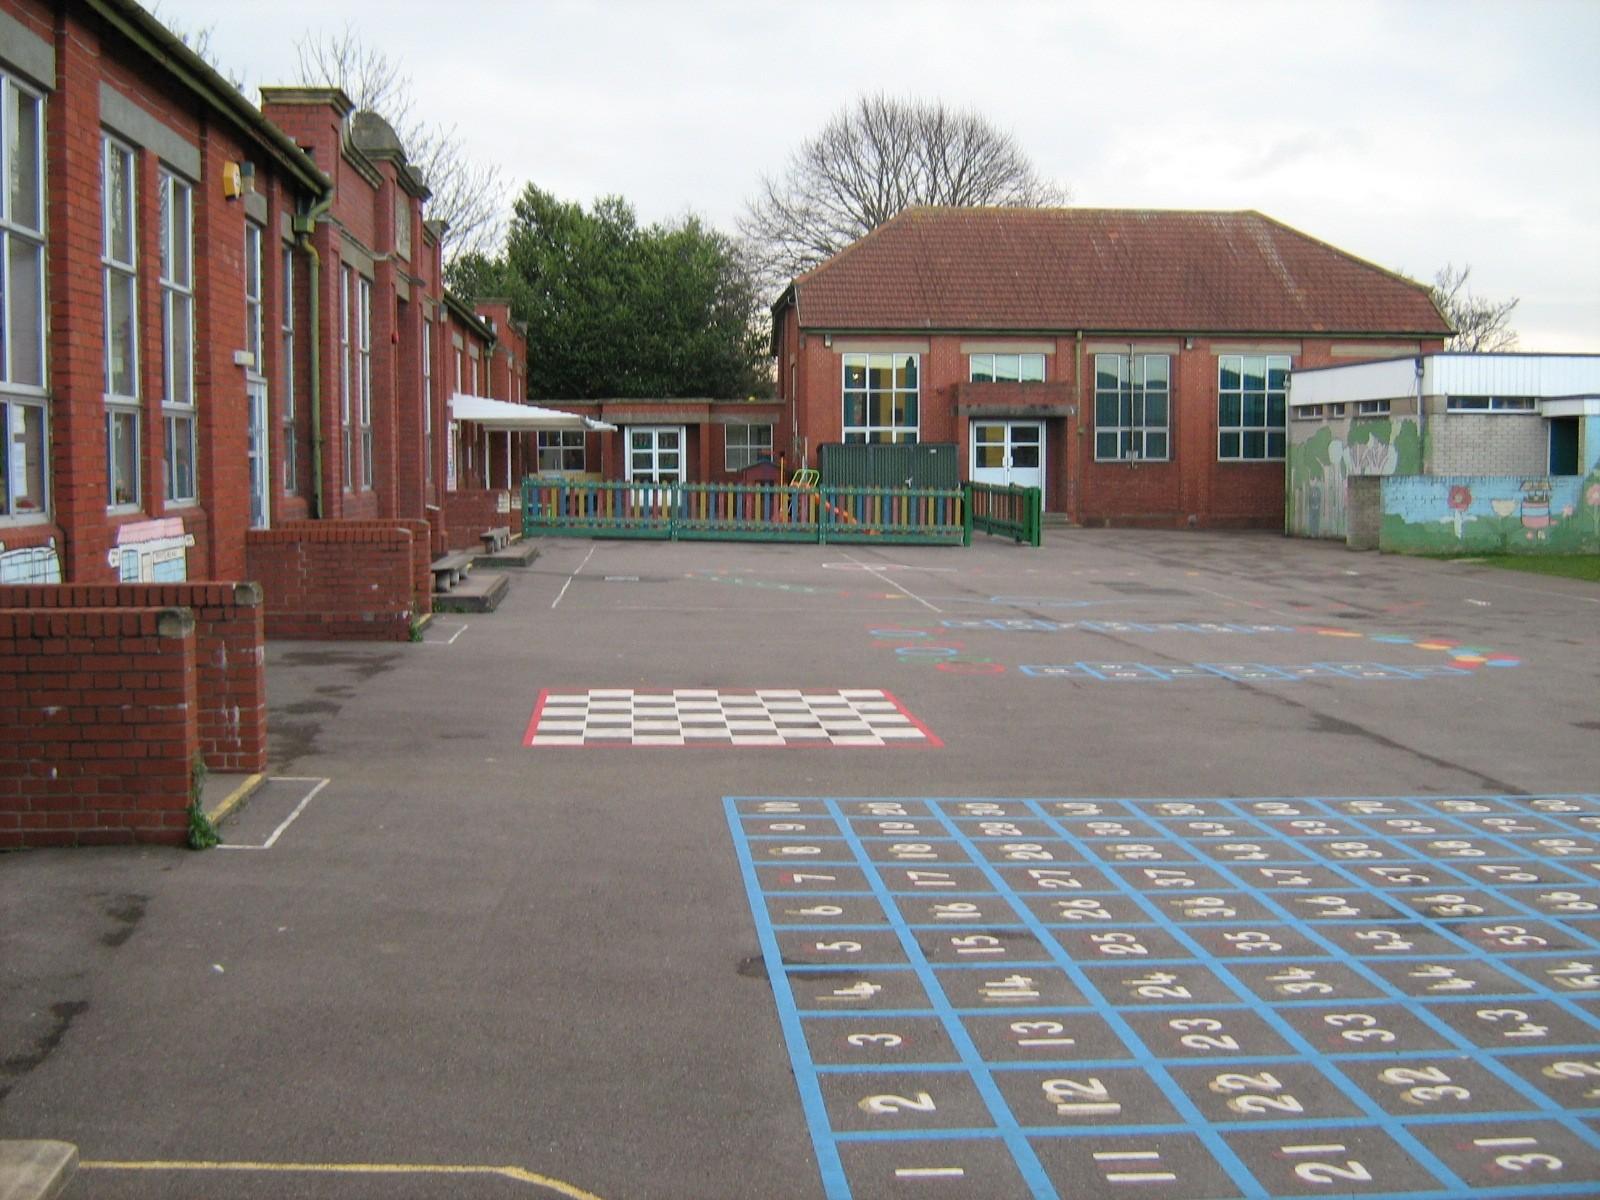 Shirehampton Primary School School BackgroundHistory 1600x1200